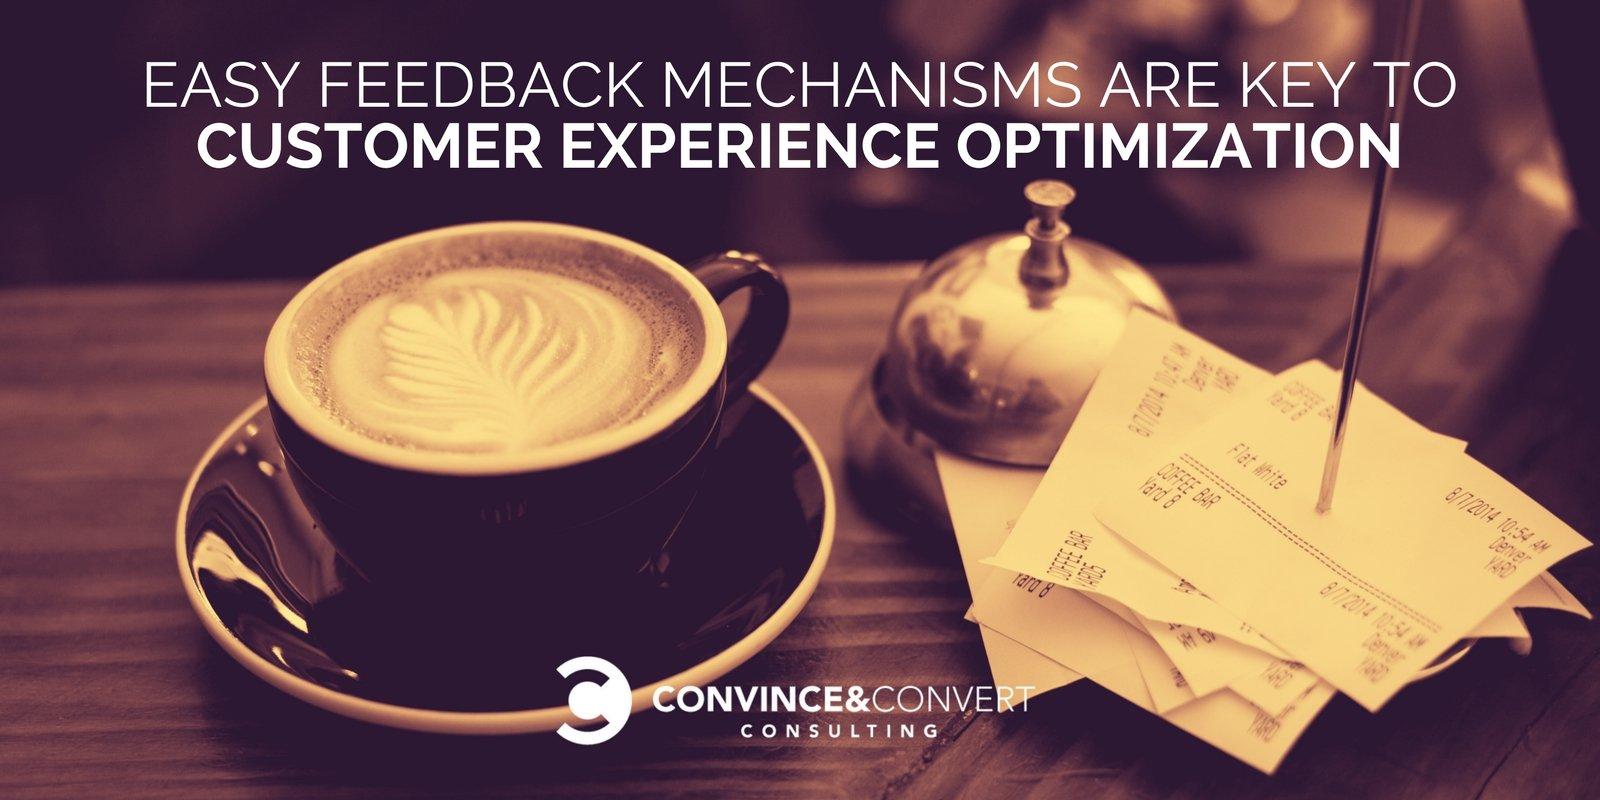 Easy Feedback Mechanisms Are Key to Customer Experience Optimization